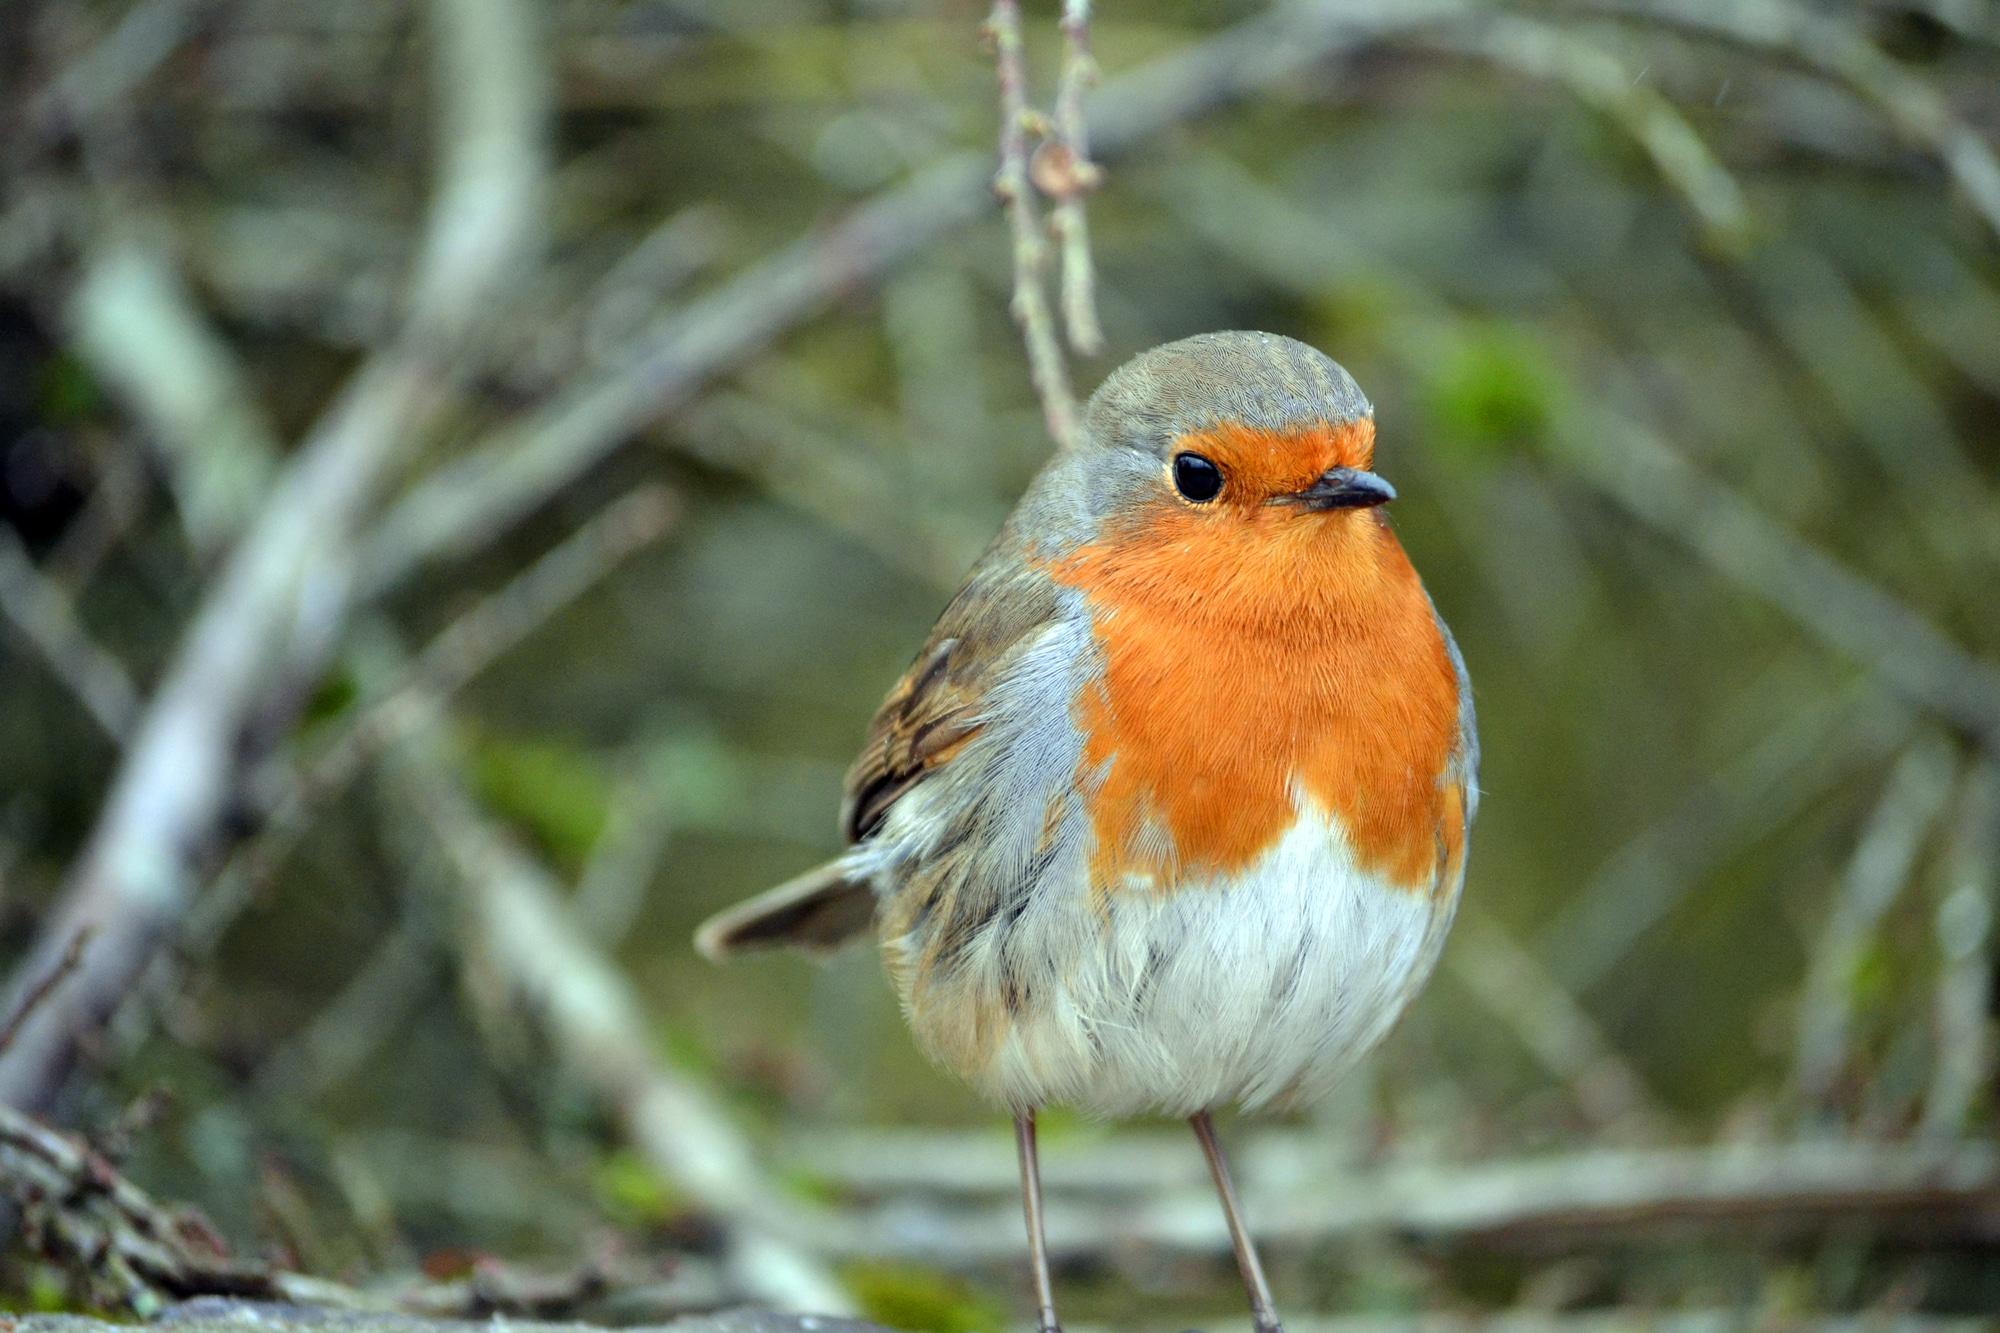 Robin bird is on table